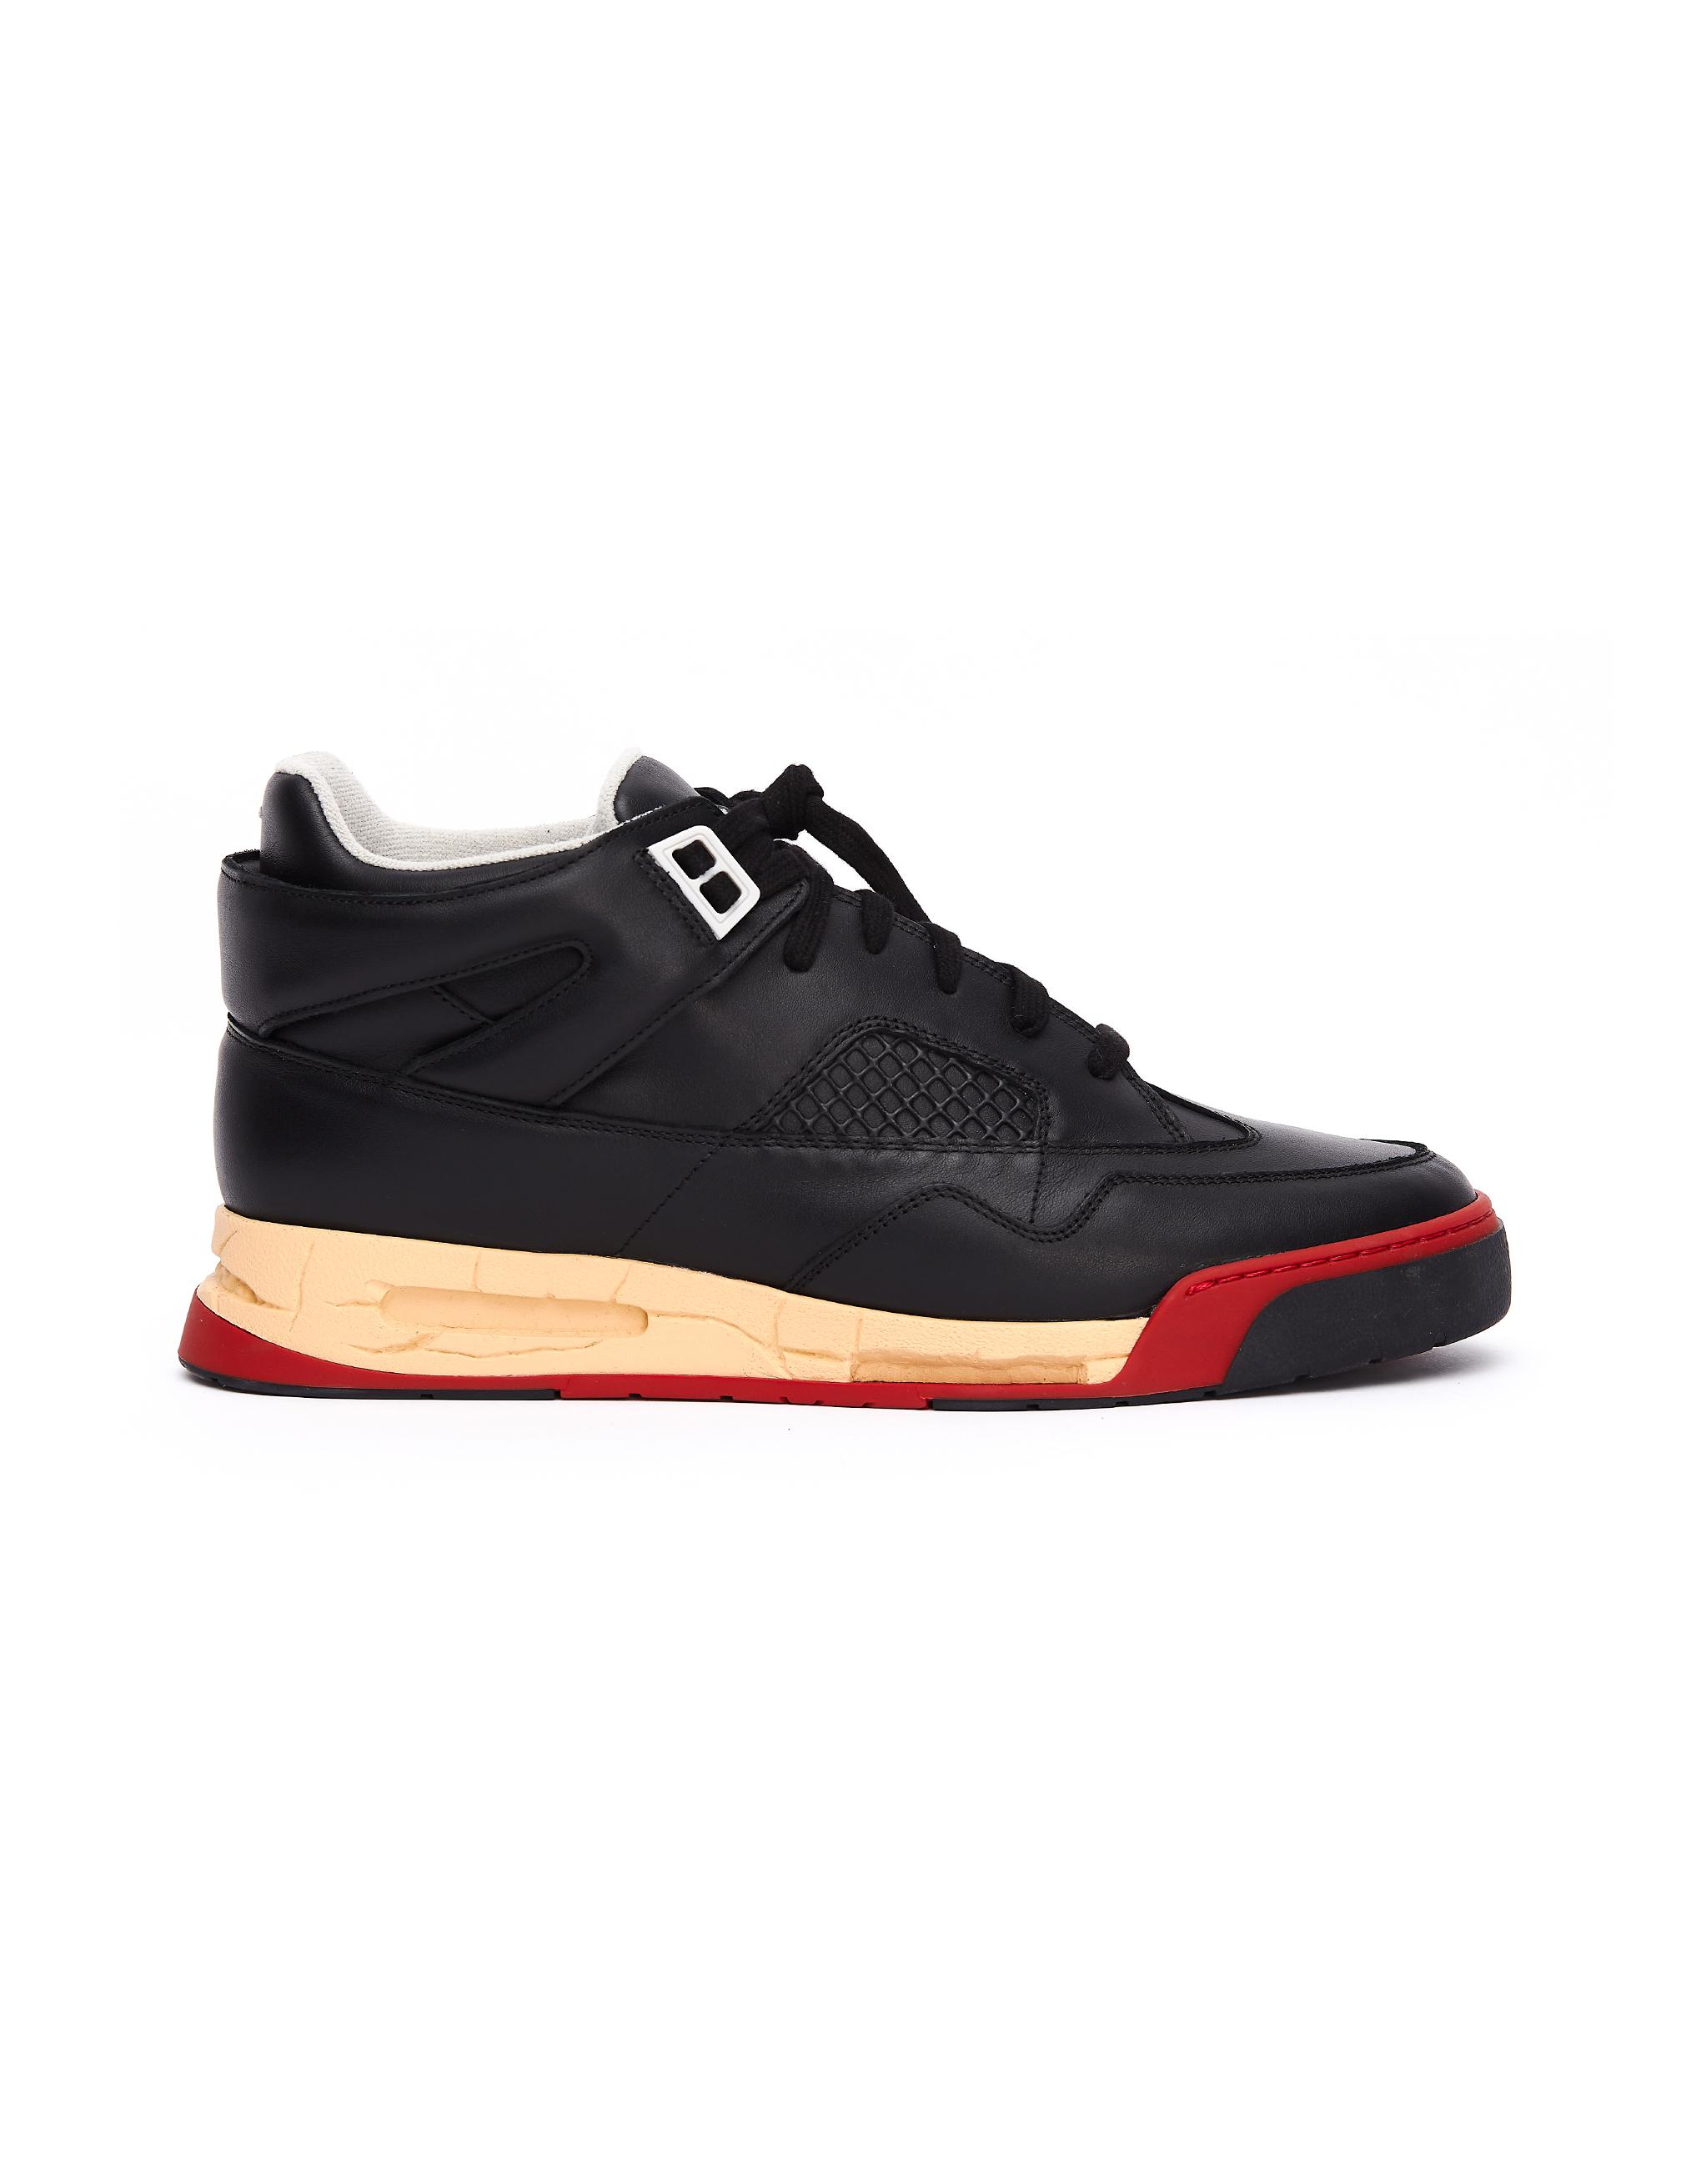 Maison Margiela DDSTCK Mid-High Black Leather Sneakers